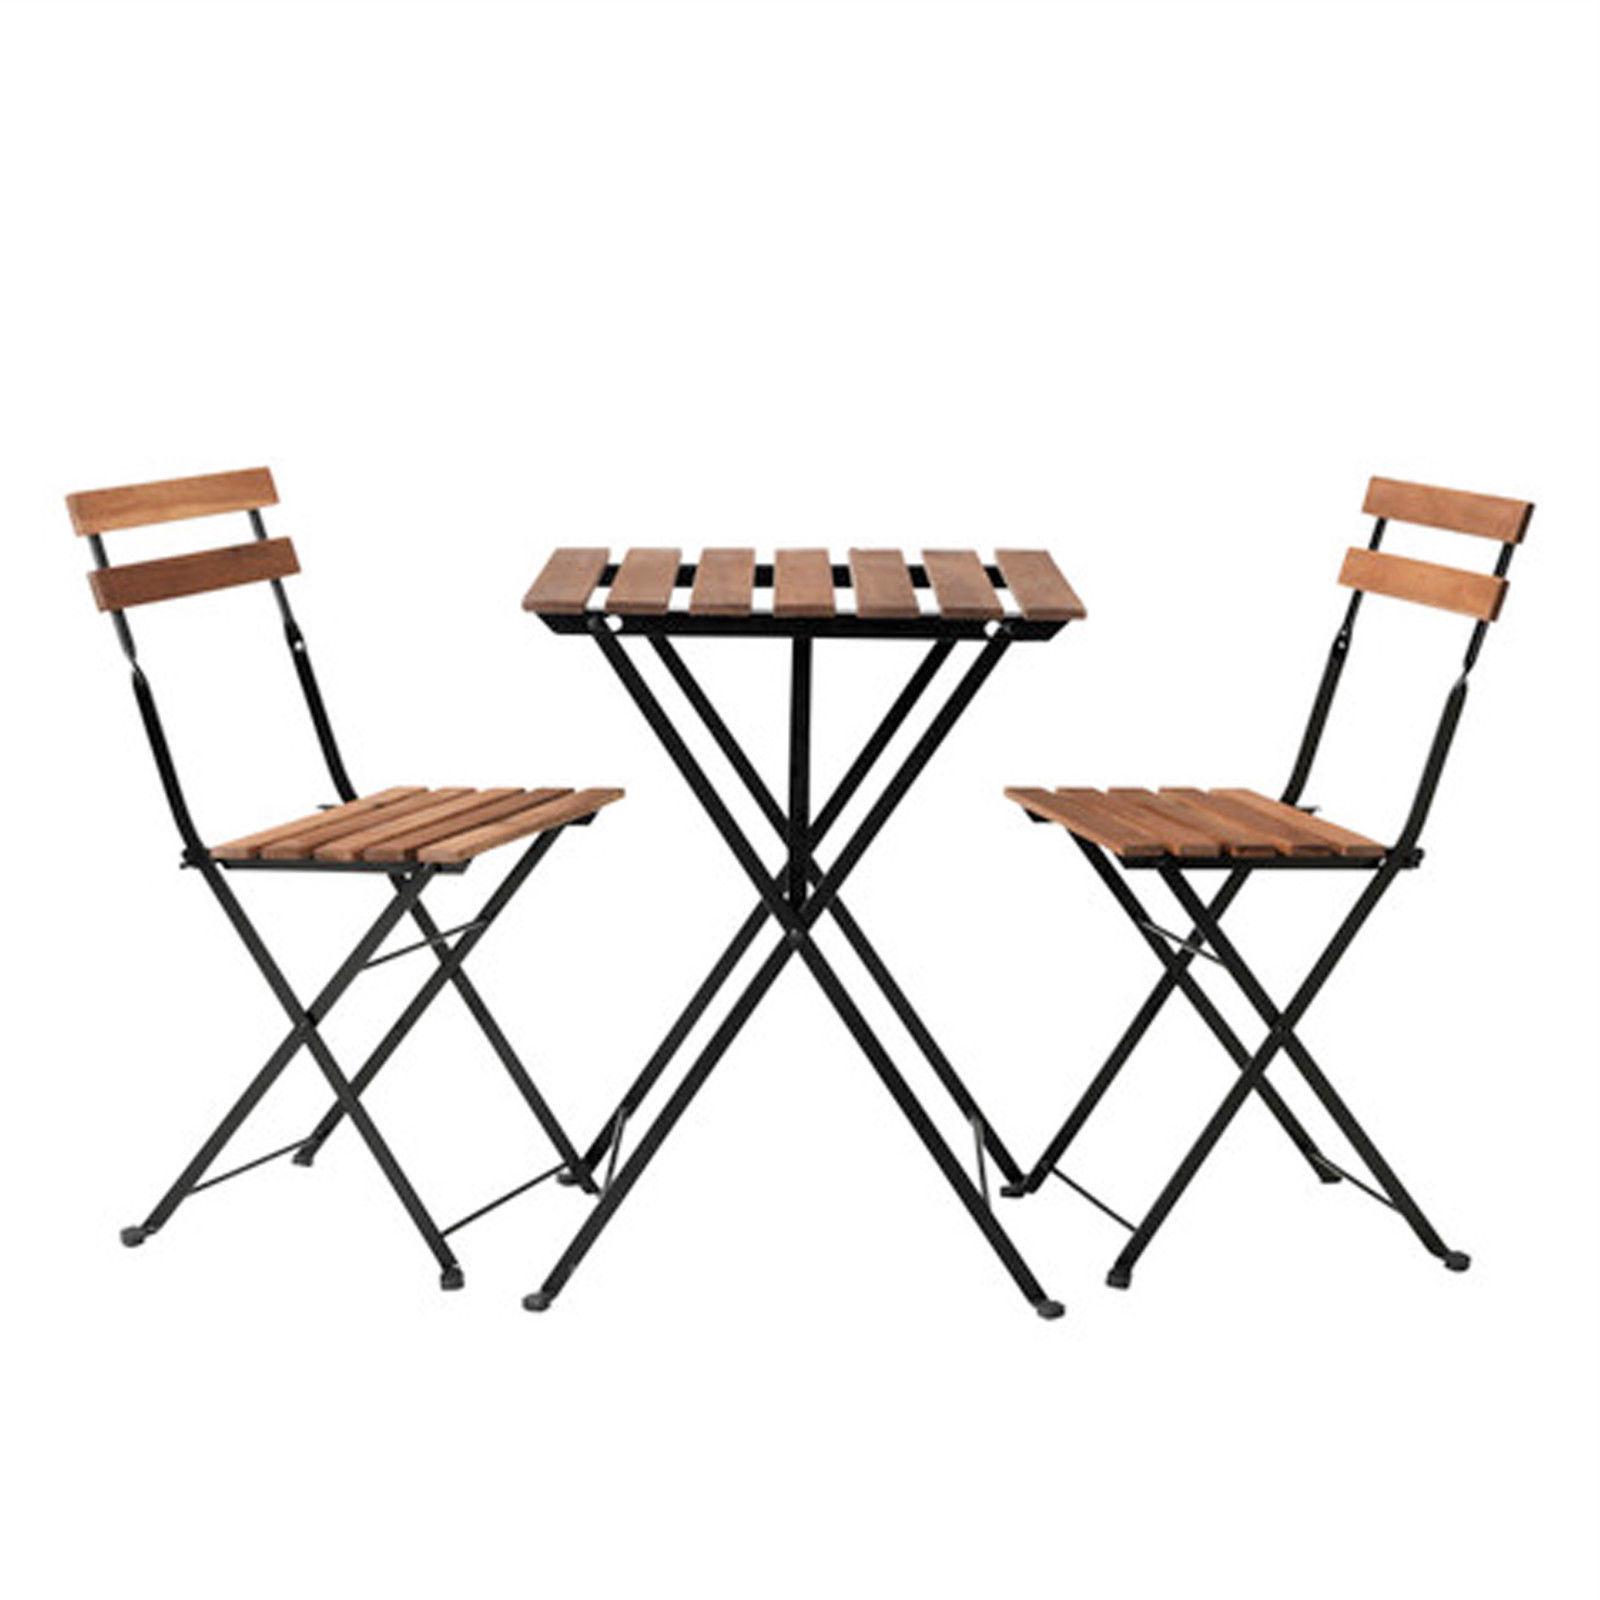 Ikea gartenmobel zubehor - Ikea gartentisch ...